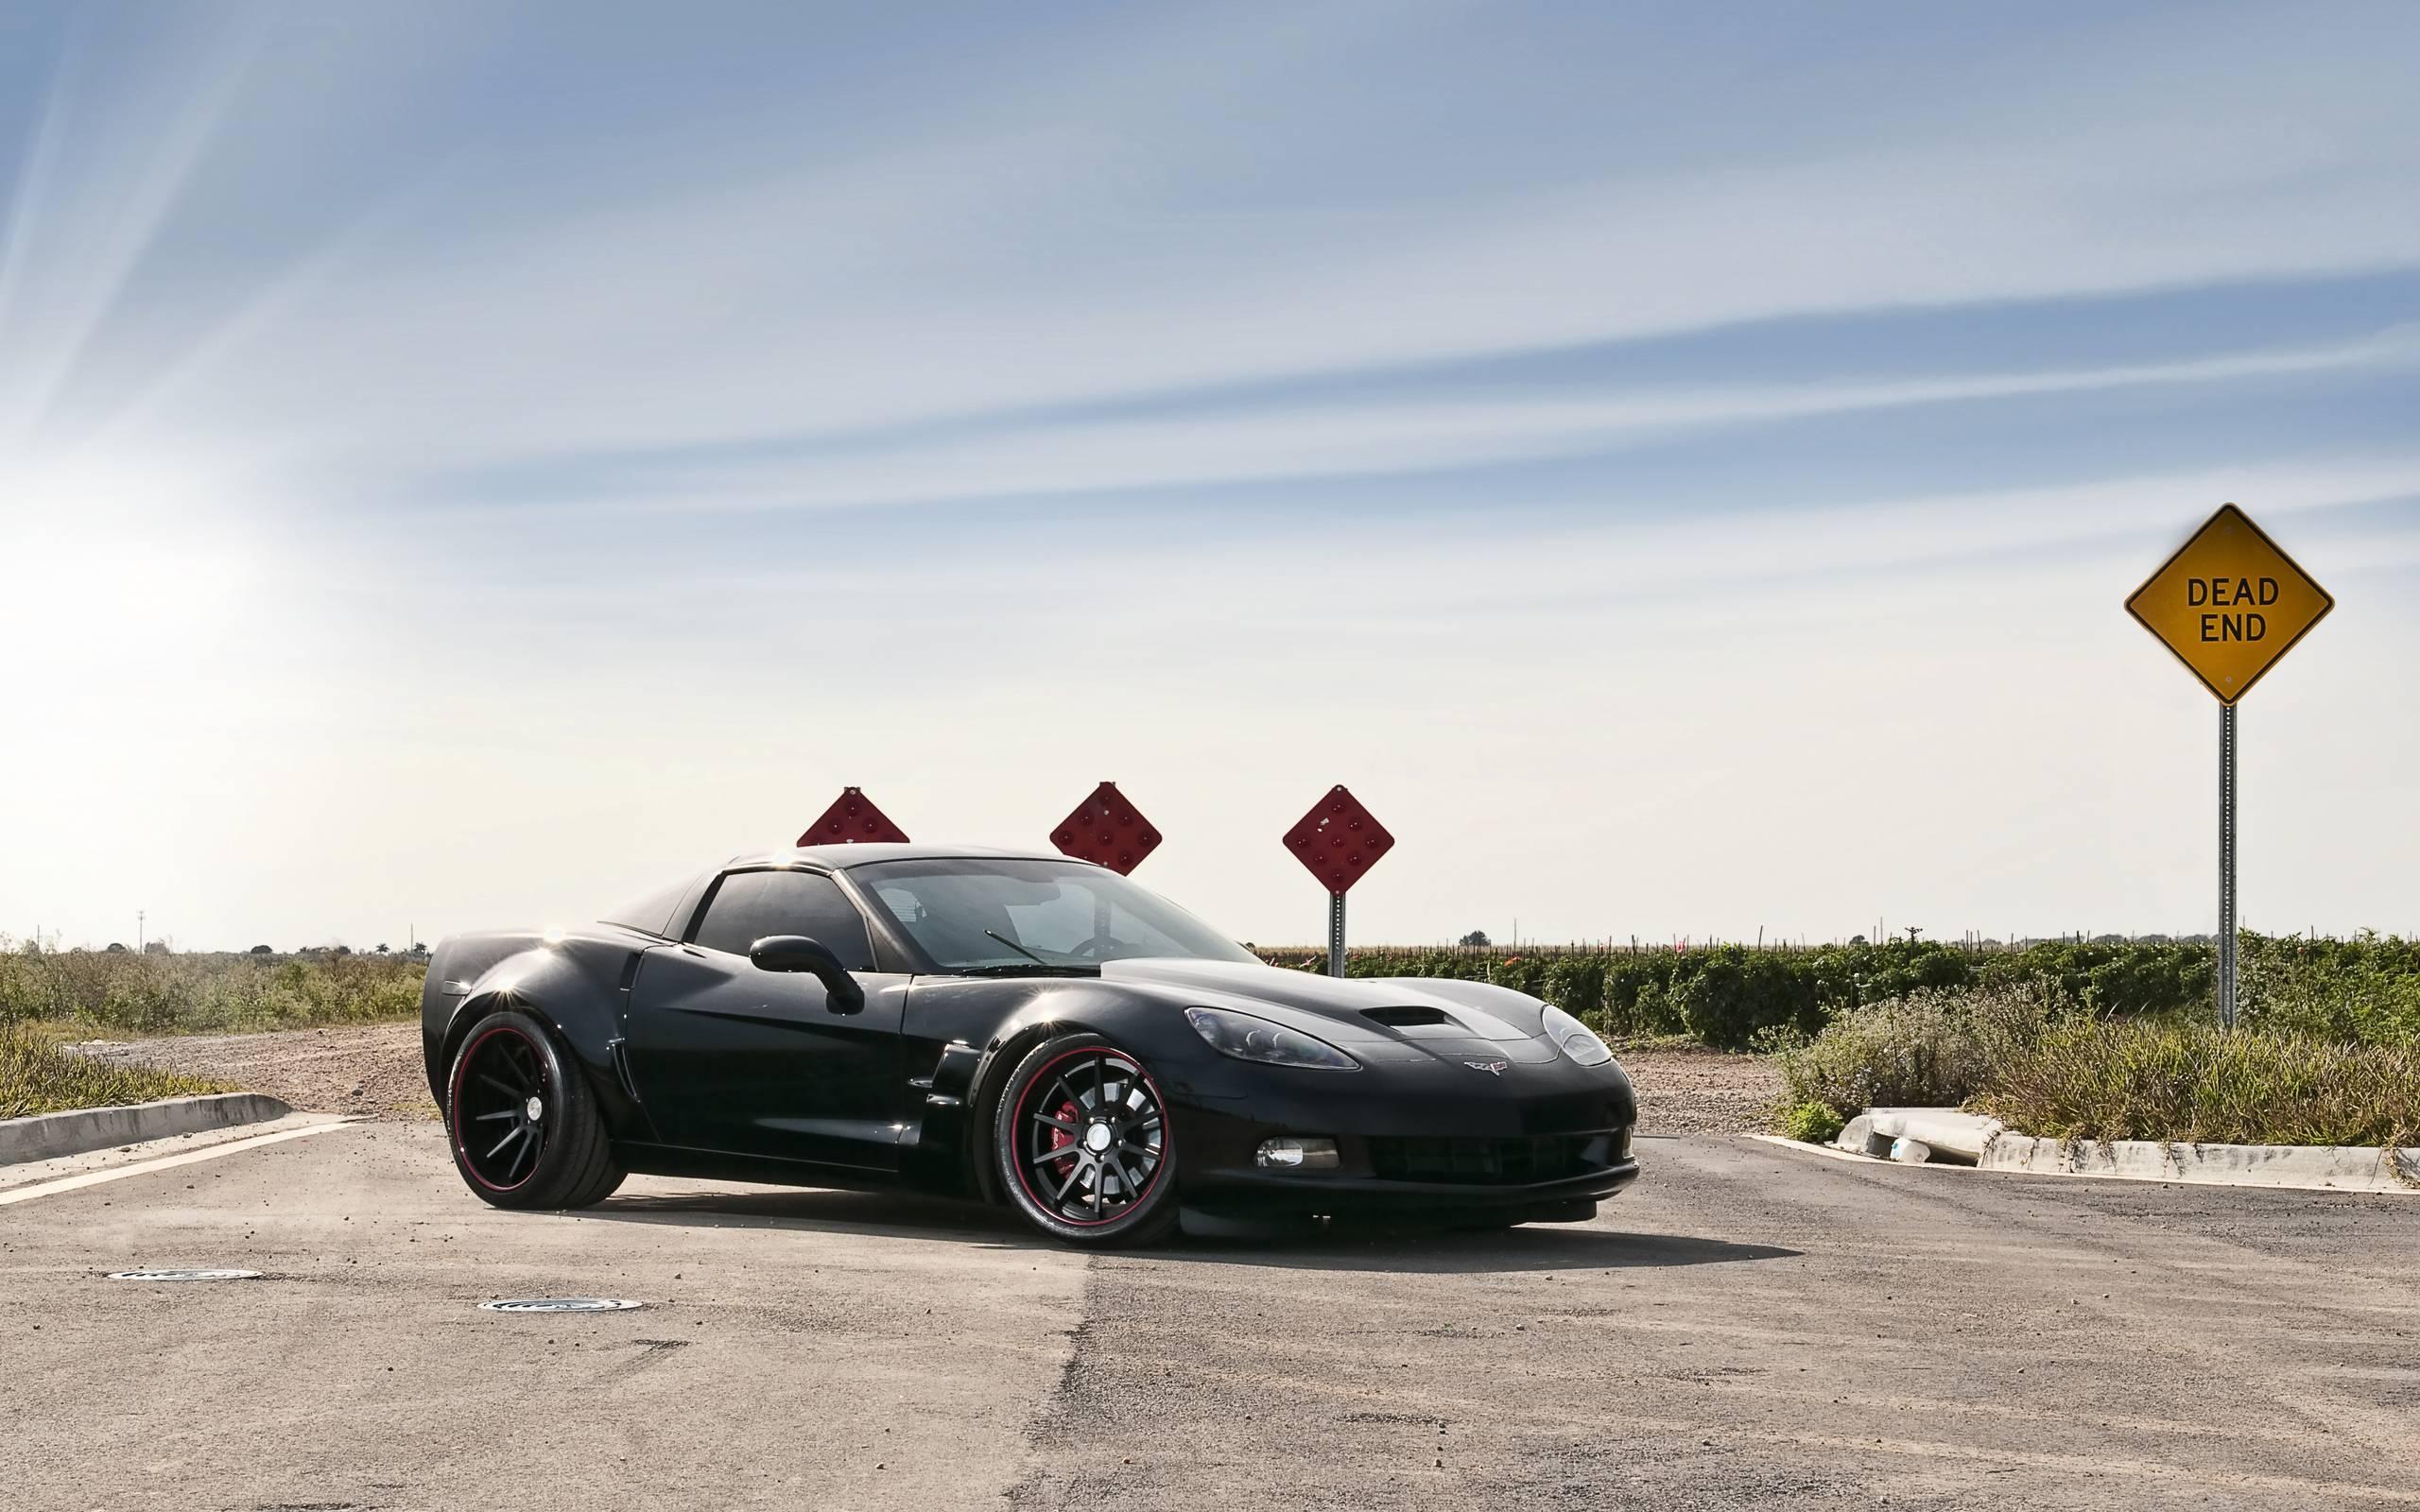 Corvette wallpapers wallpaper cave - Corvette c6 wallpaper ...